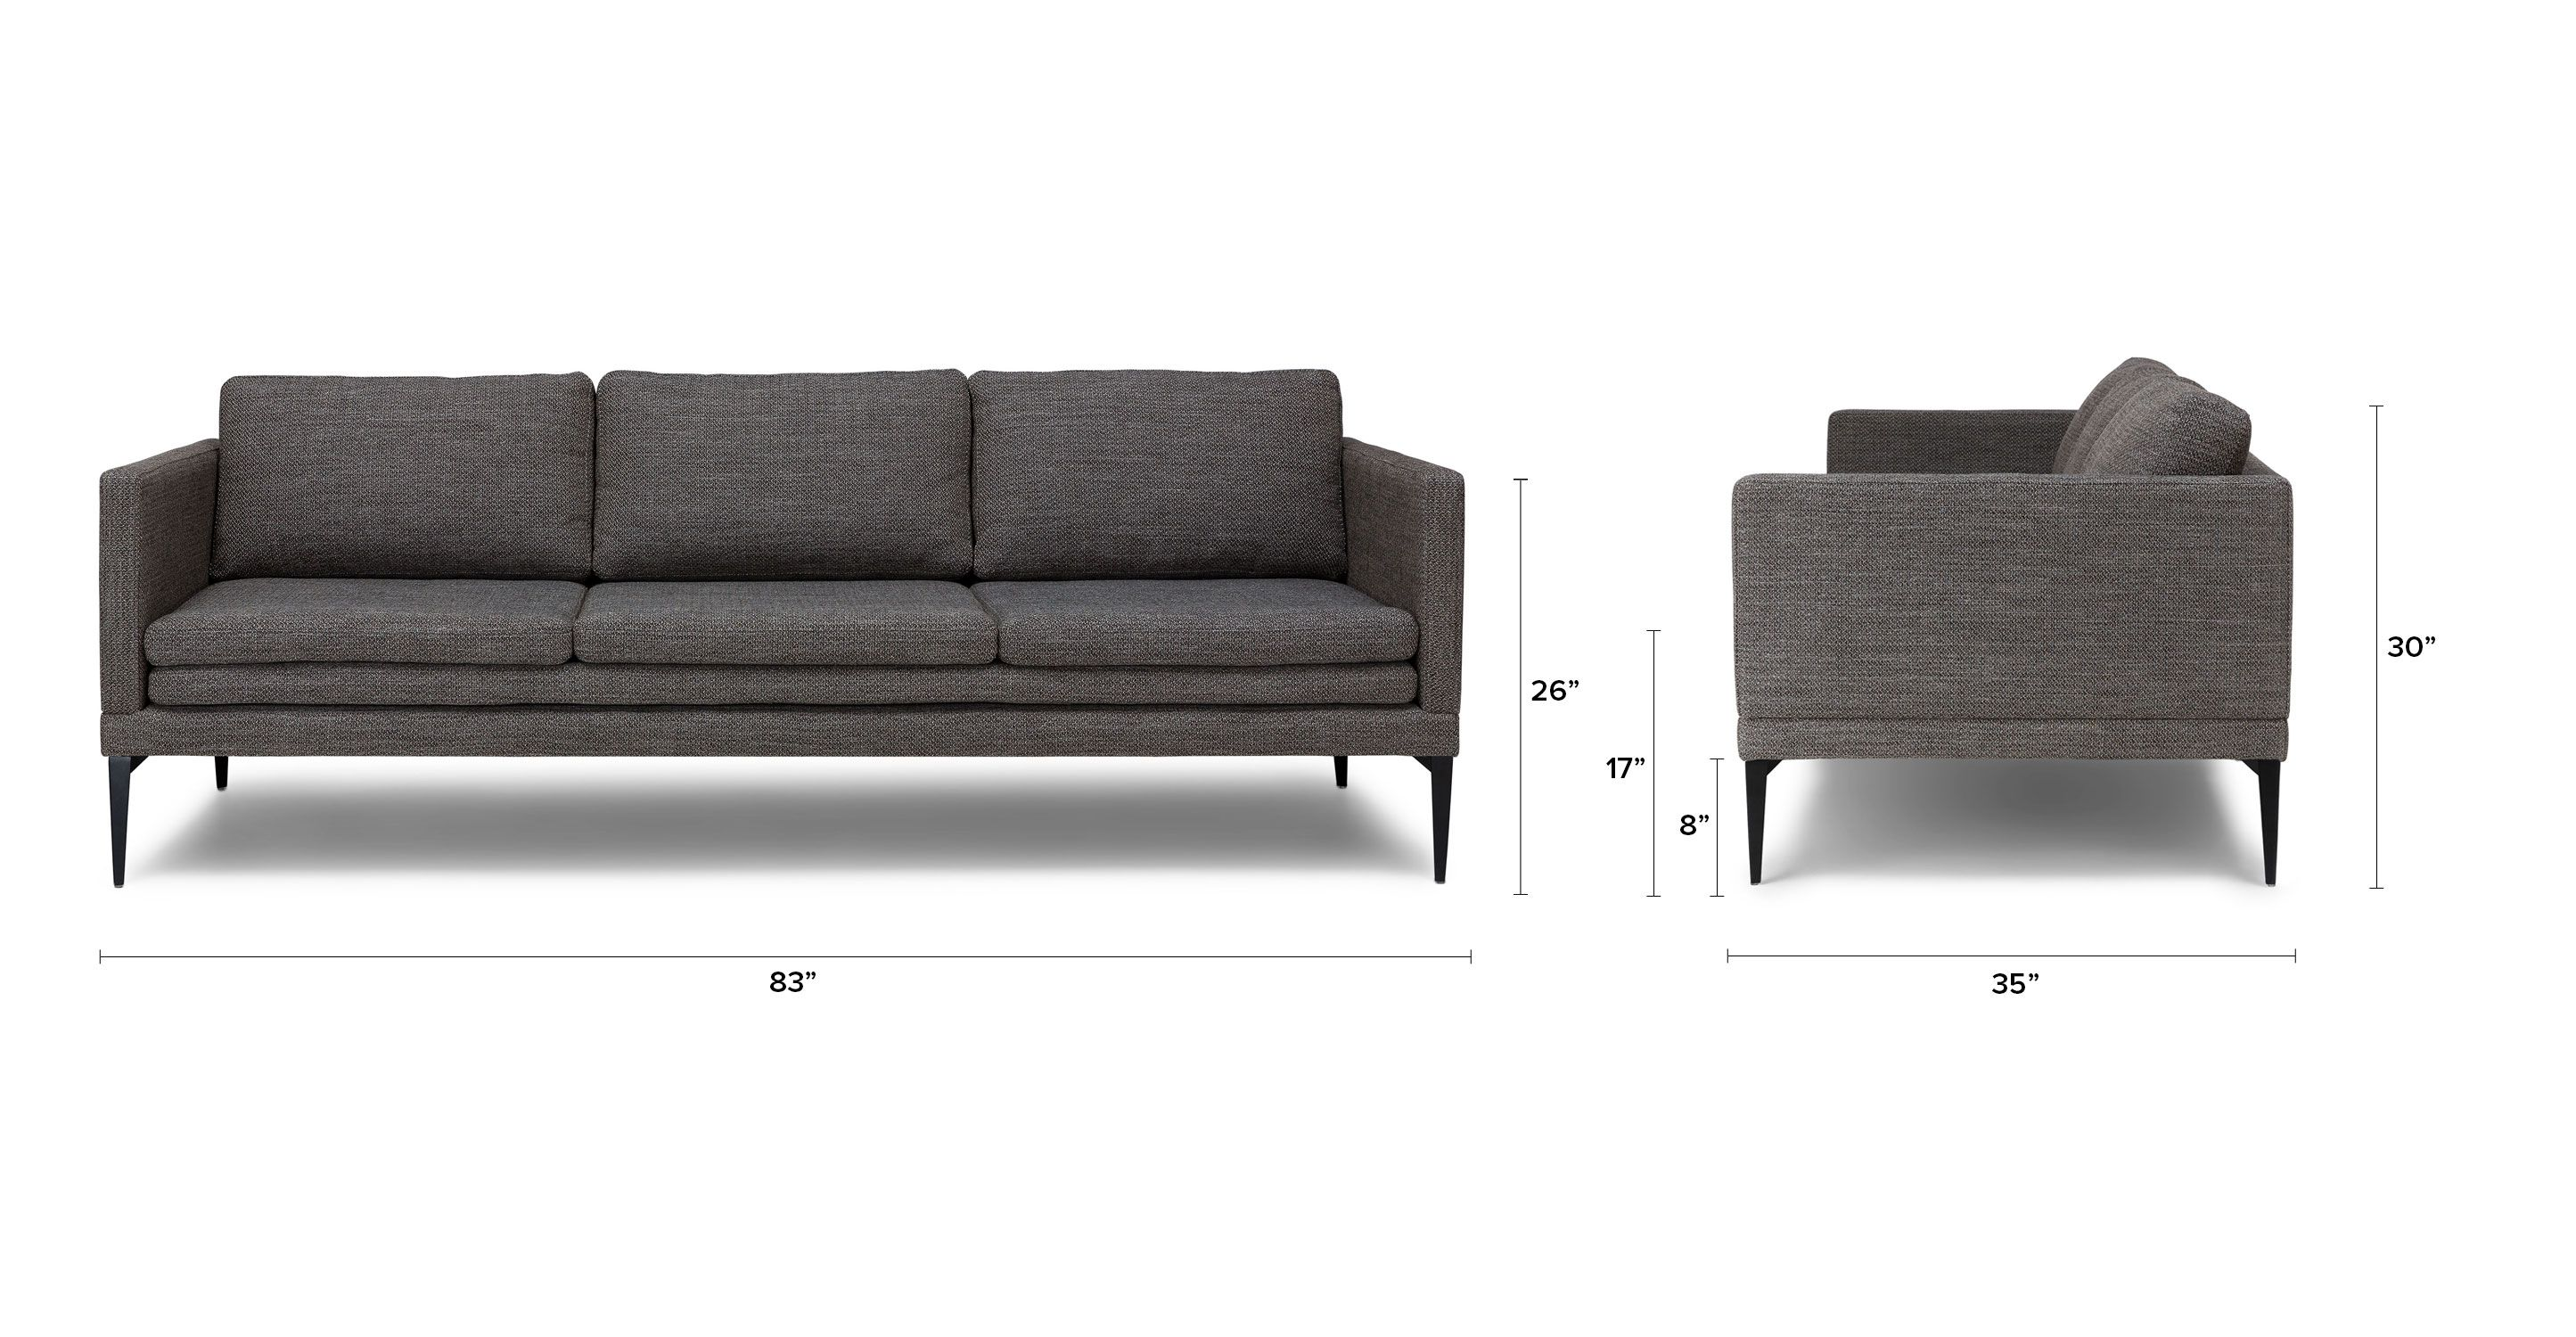 Gray Contemporary Sofa Triplo Contemporary Furniture Modern